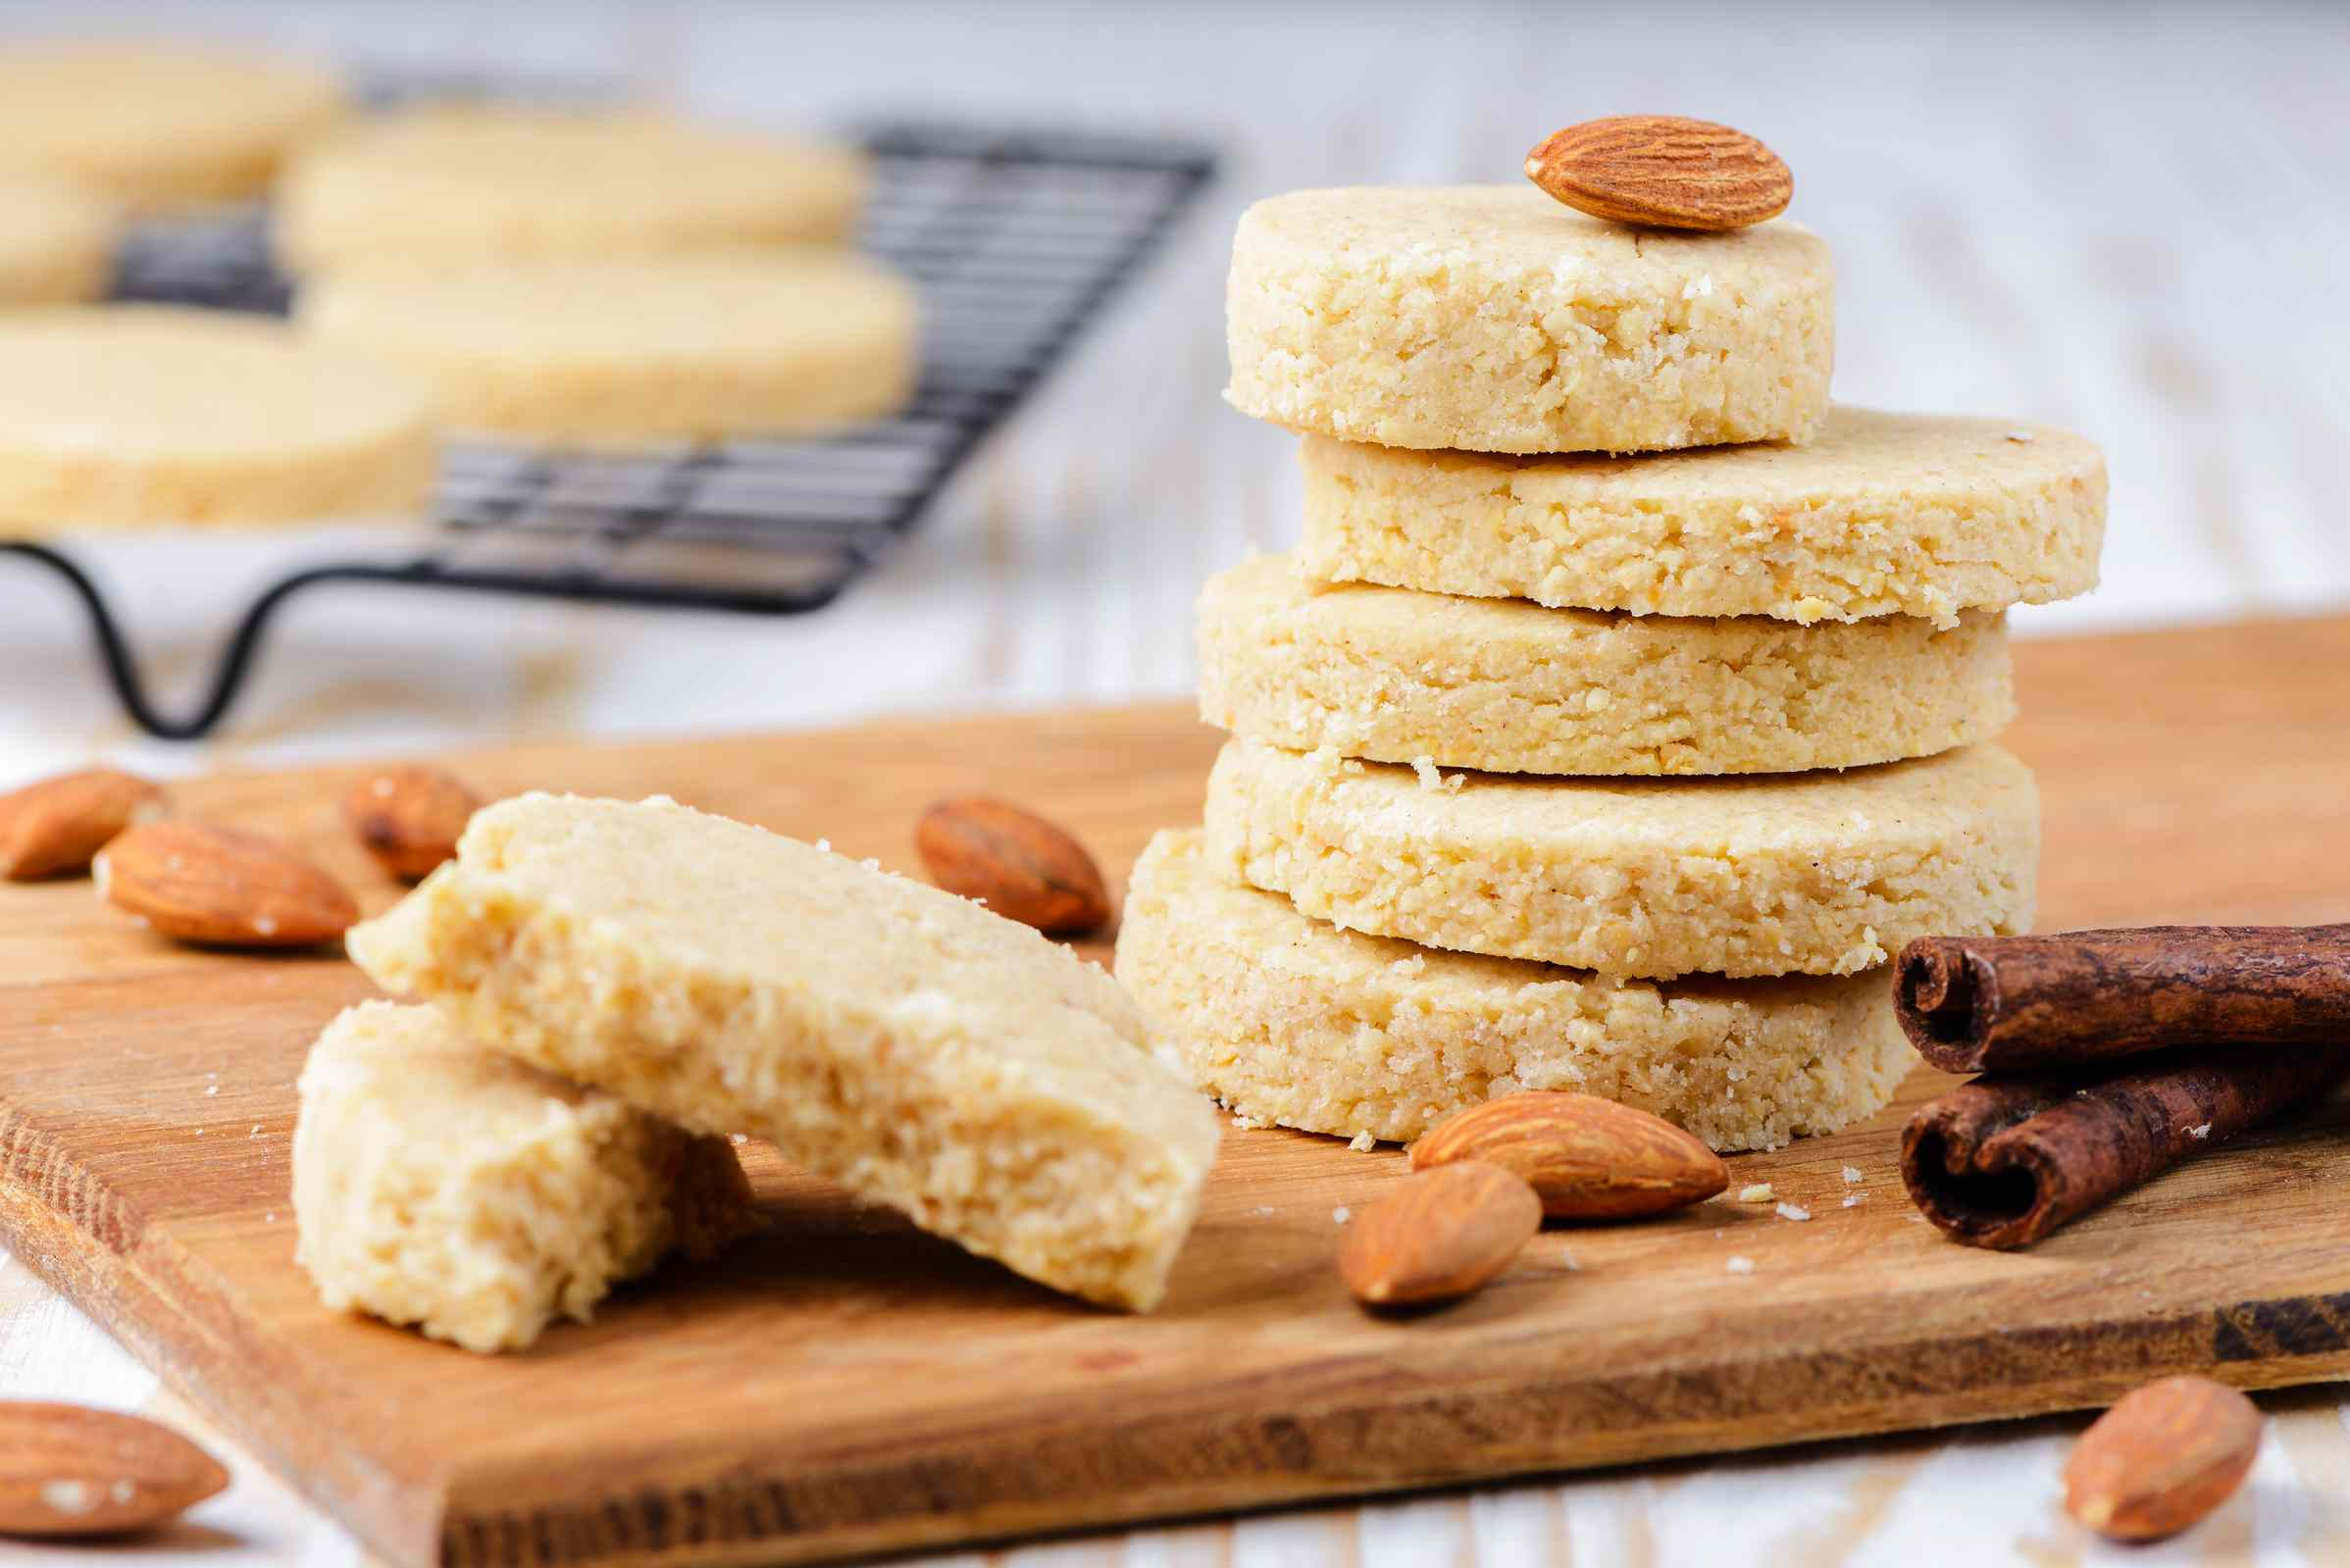 polvorones-recipe-almond-cookies-3083024-hero-01-8cd098ea17e2464687158927e06e22f6